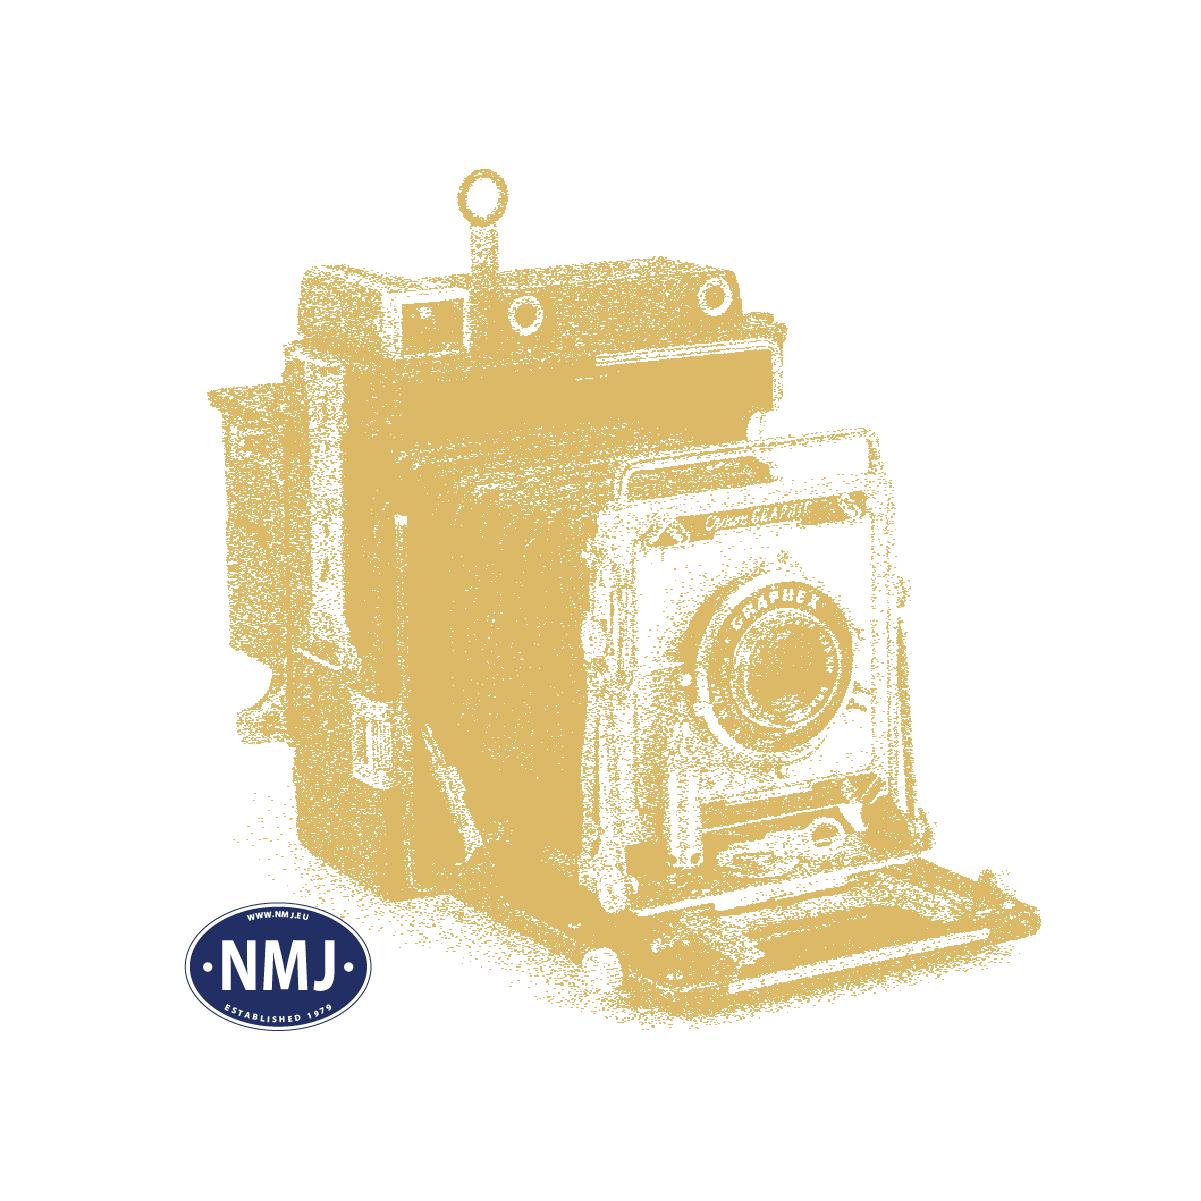 NMJT90016 - NMJ Topline NSB Di3a.618, neue Farbgebung, DC